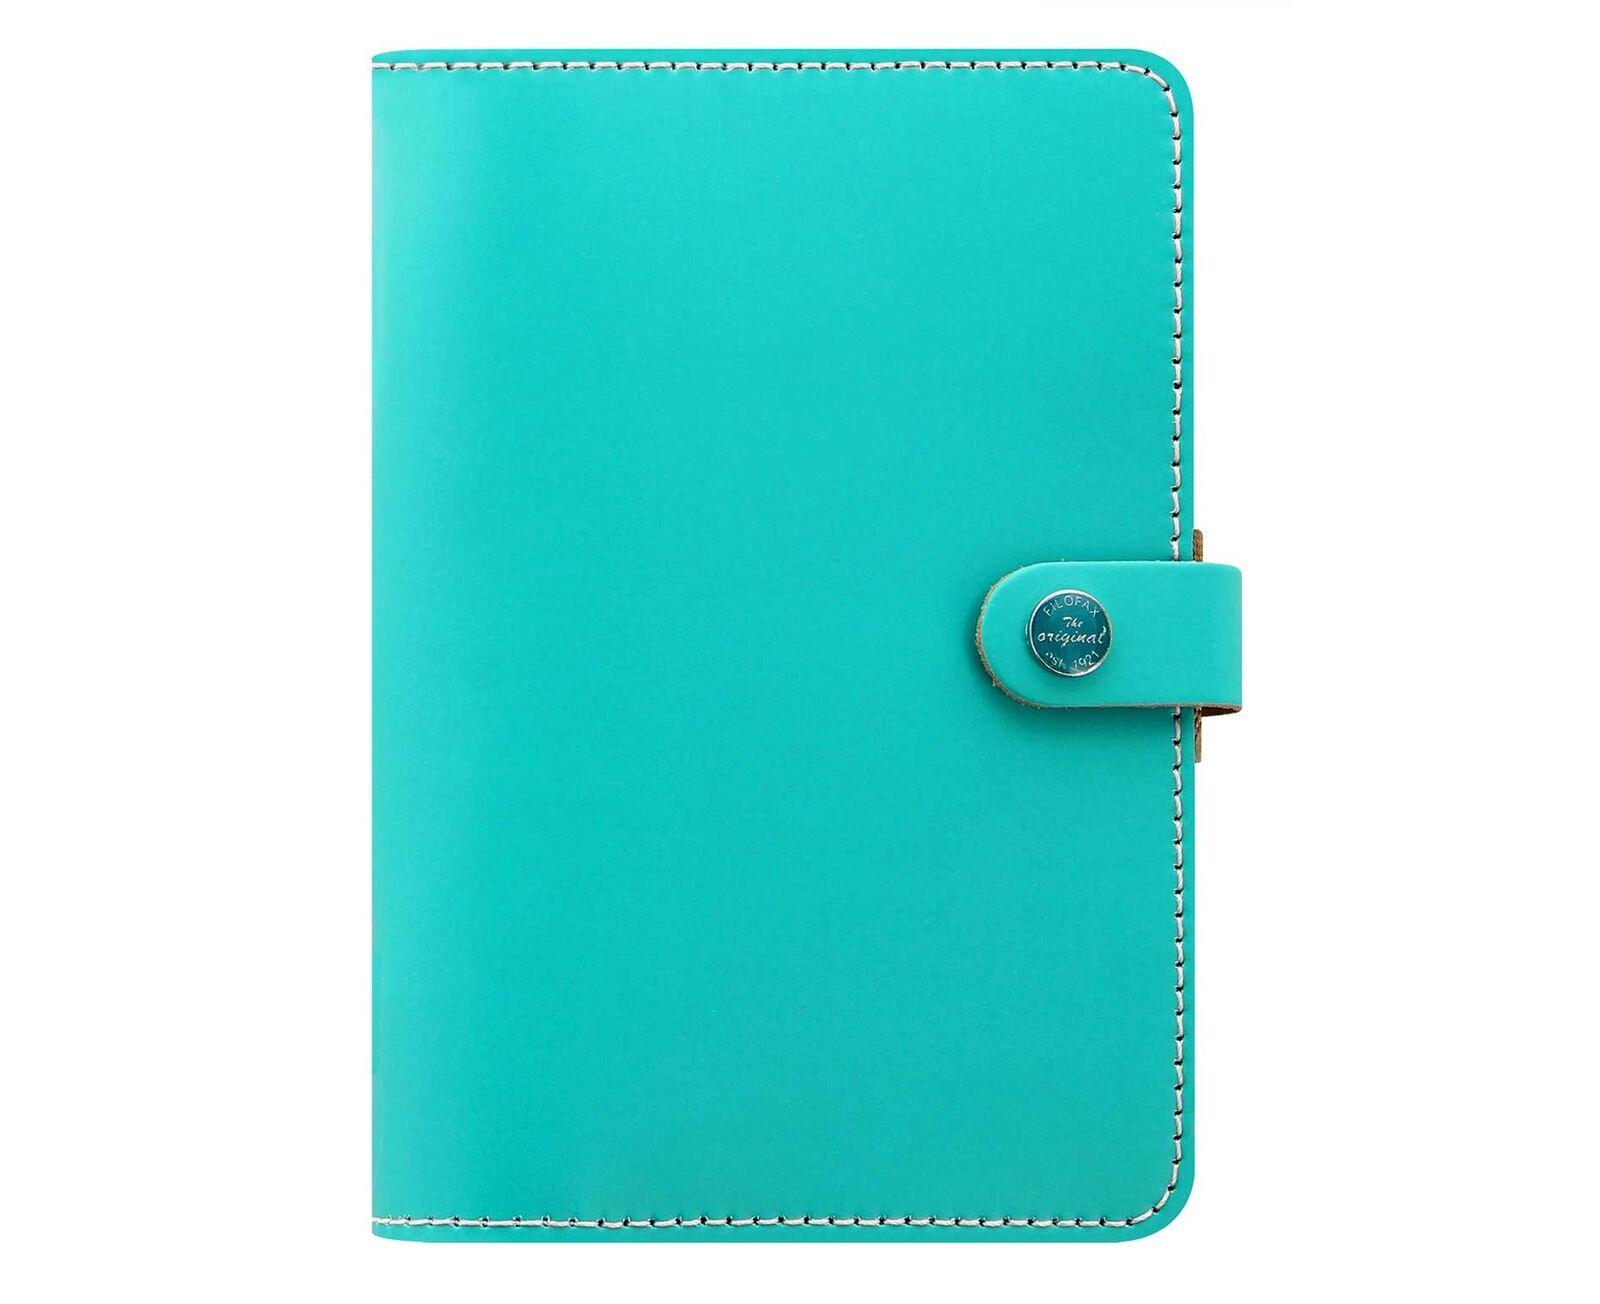 Filofax Personal Organiser The Original Turquoise